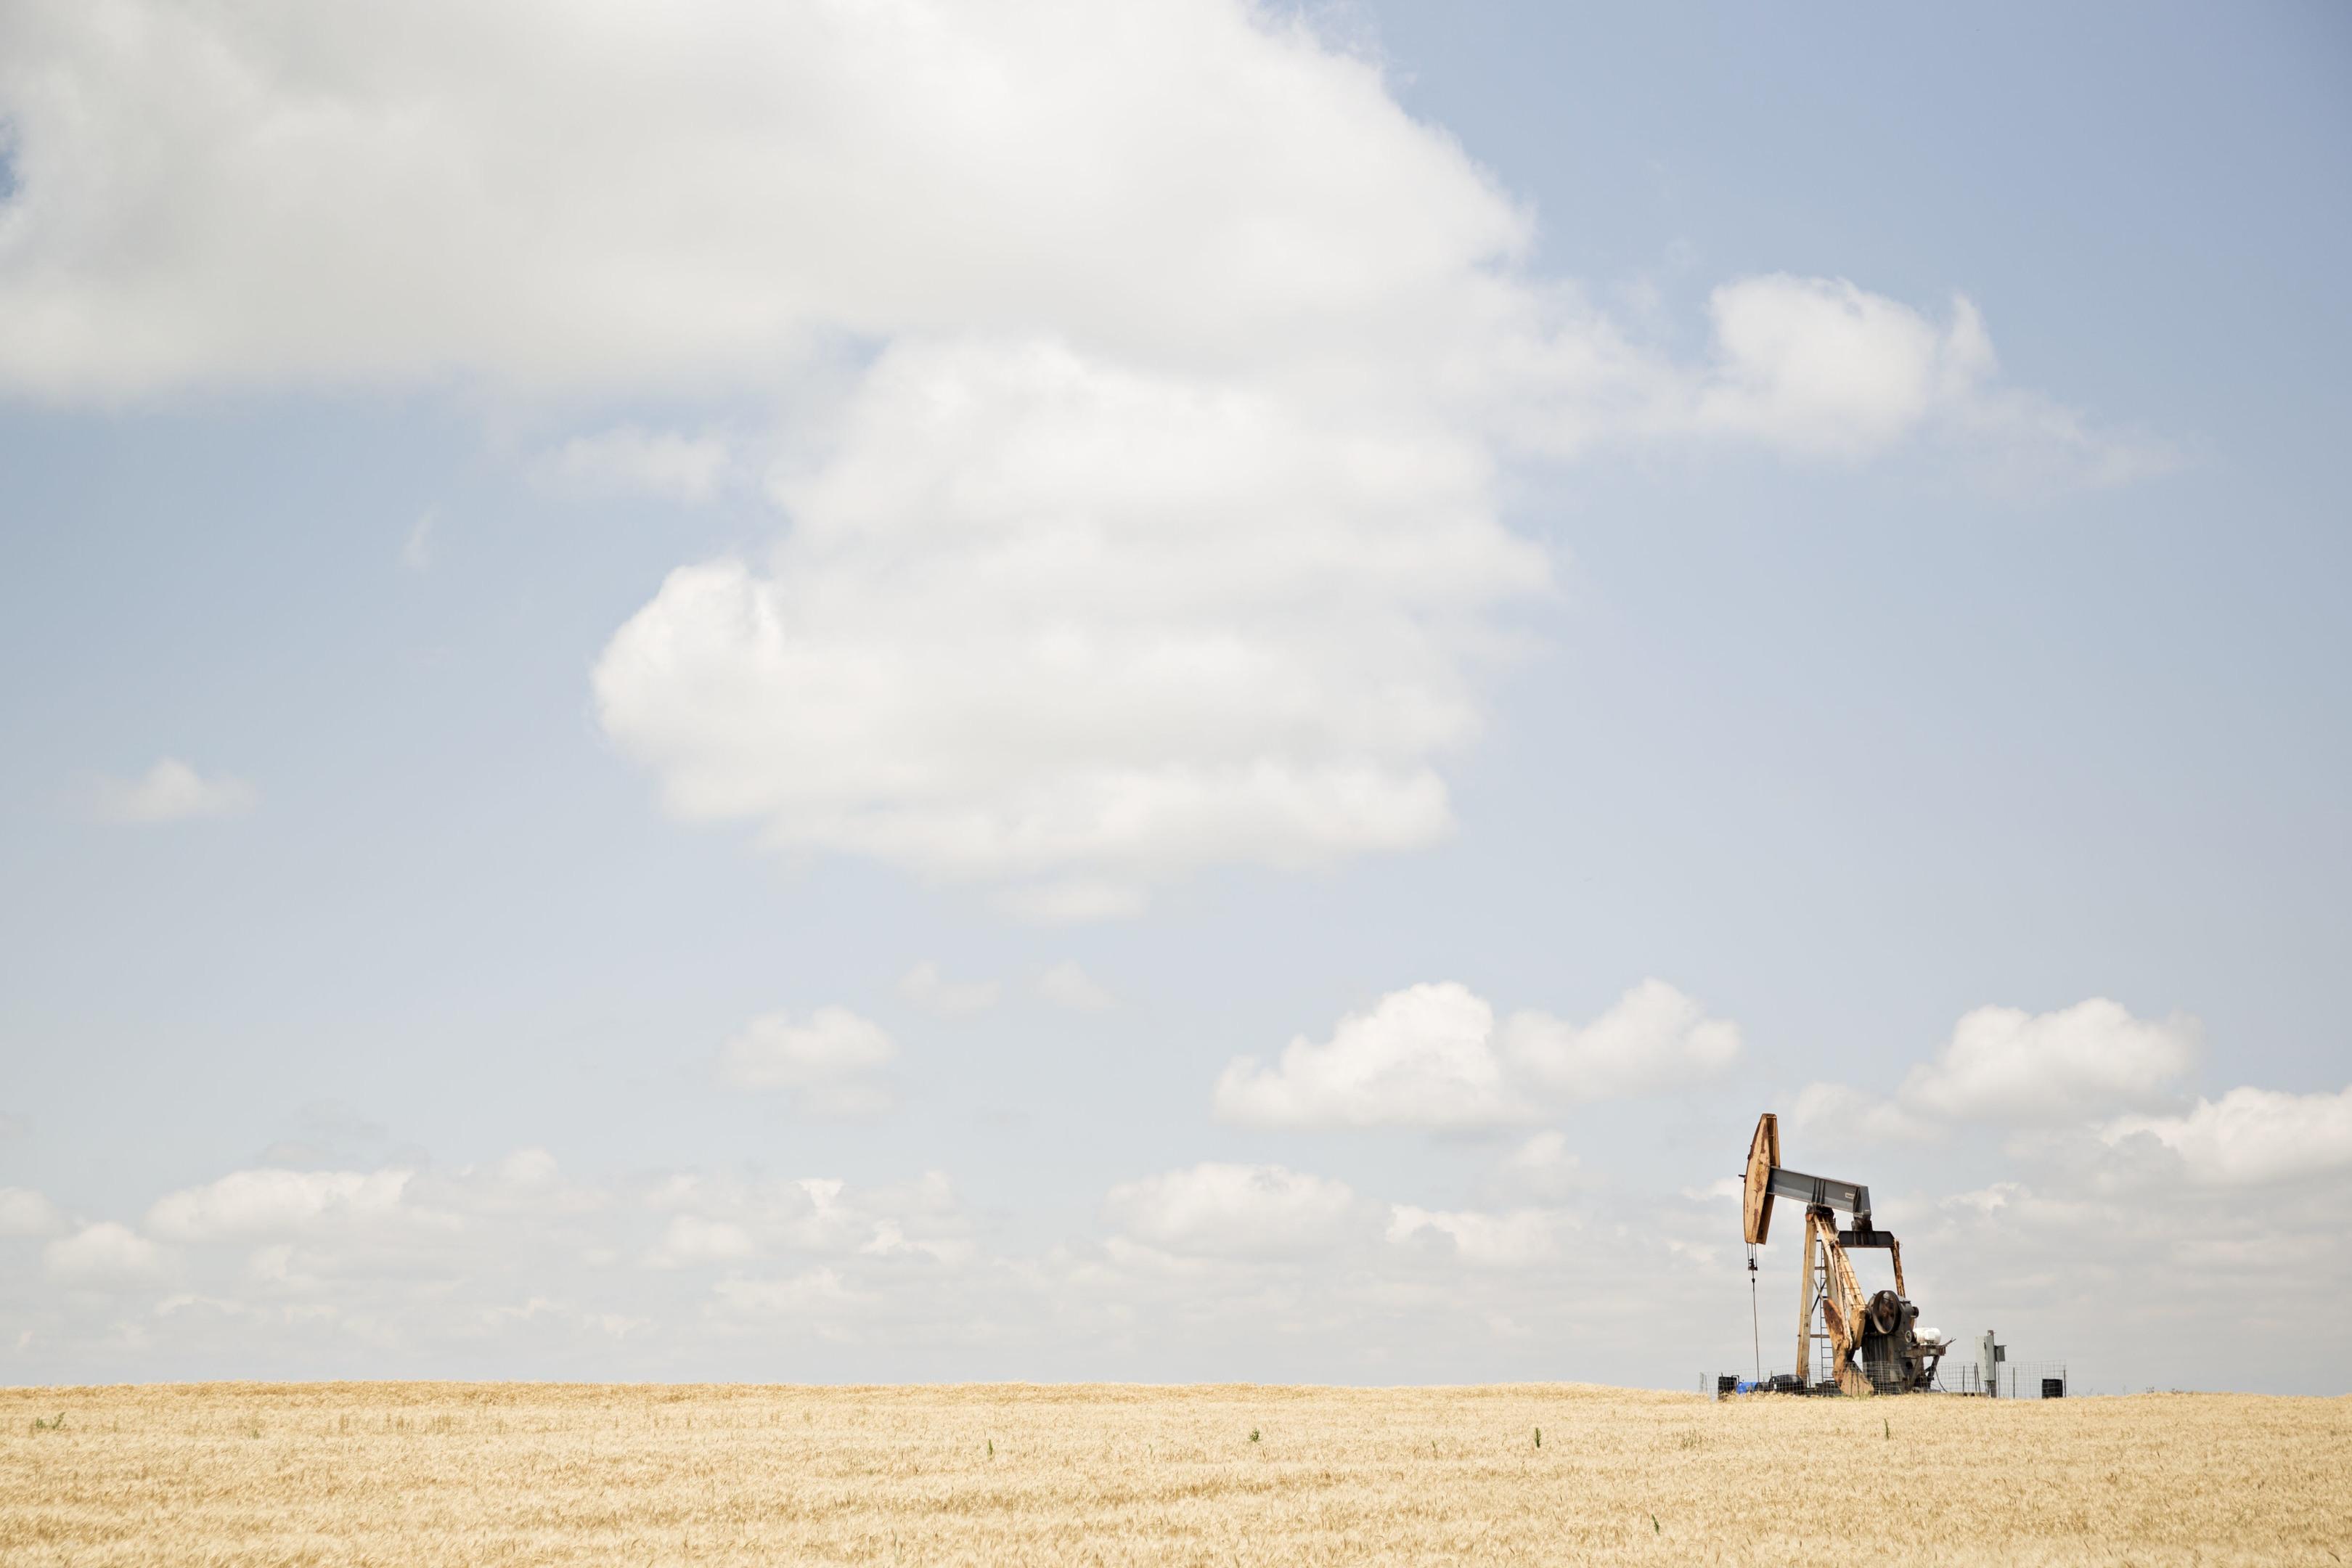 A pumpjack operates in the Bemis-Shutts oil field near Hays, Kansas, U.S., on Thursday, June 29, 2017. Photographer: Daniel Acker/Bloomberg